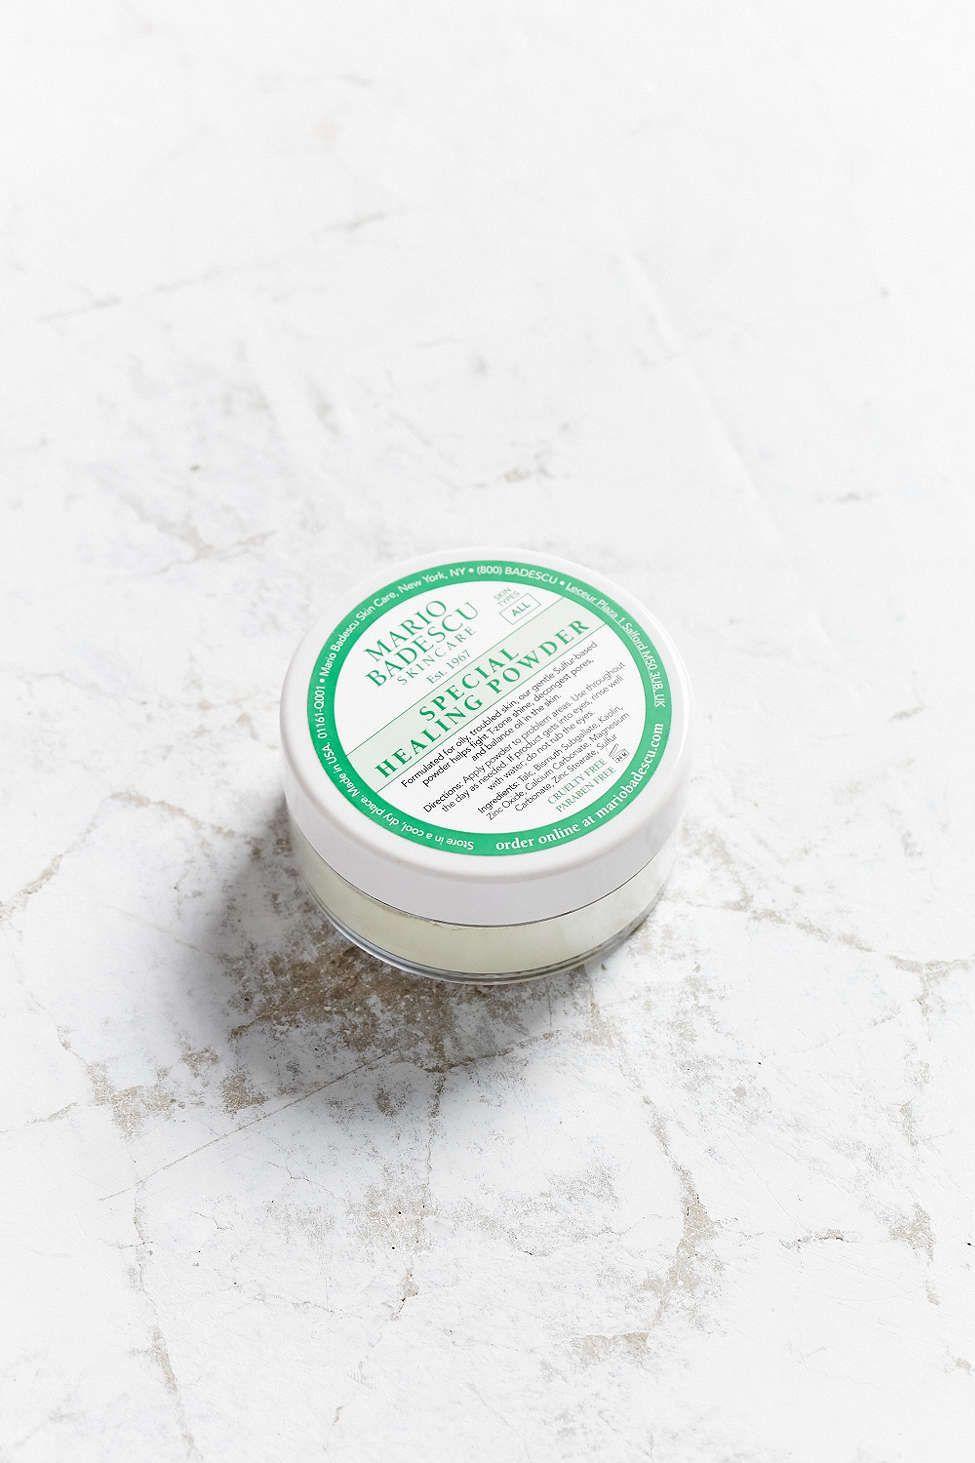 Mario Badescu Special Healing Powder Mario Badescu Acne Treatment Cream Natural Organic Skincare